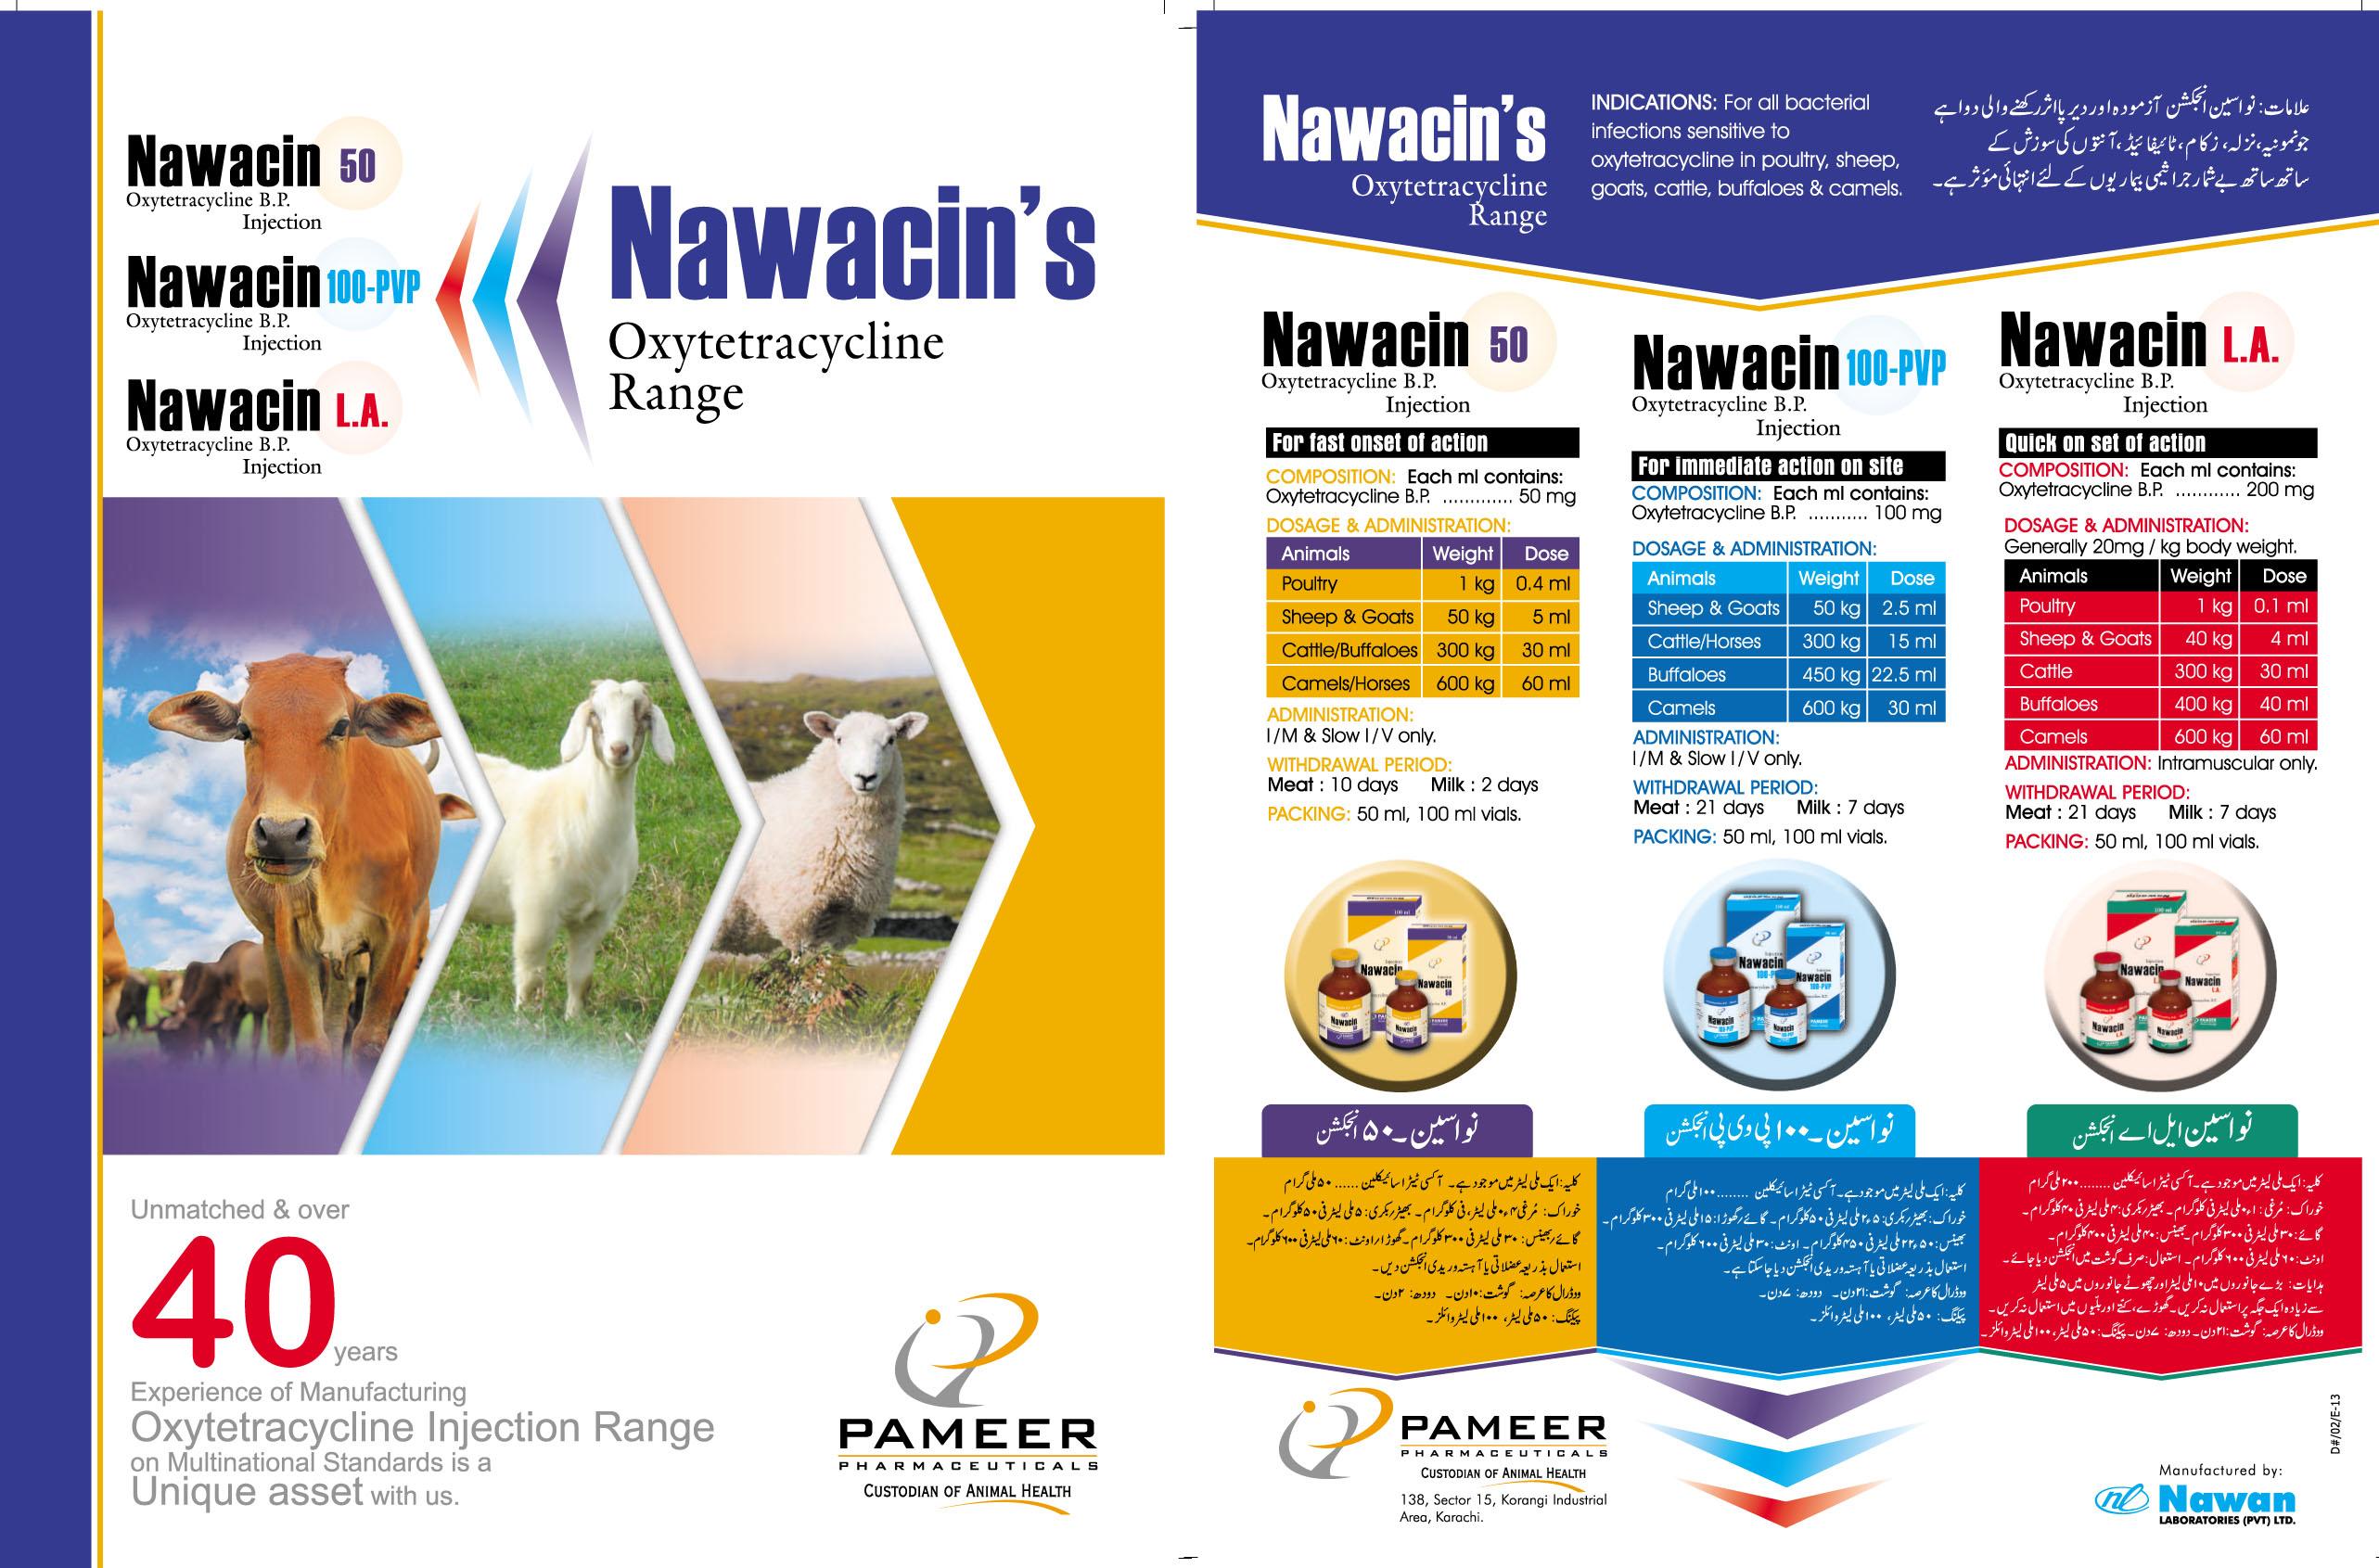 Nawacin 100 pvp injection!